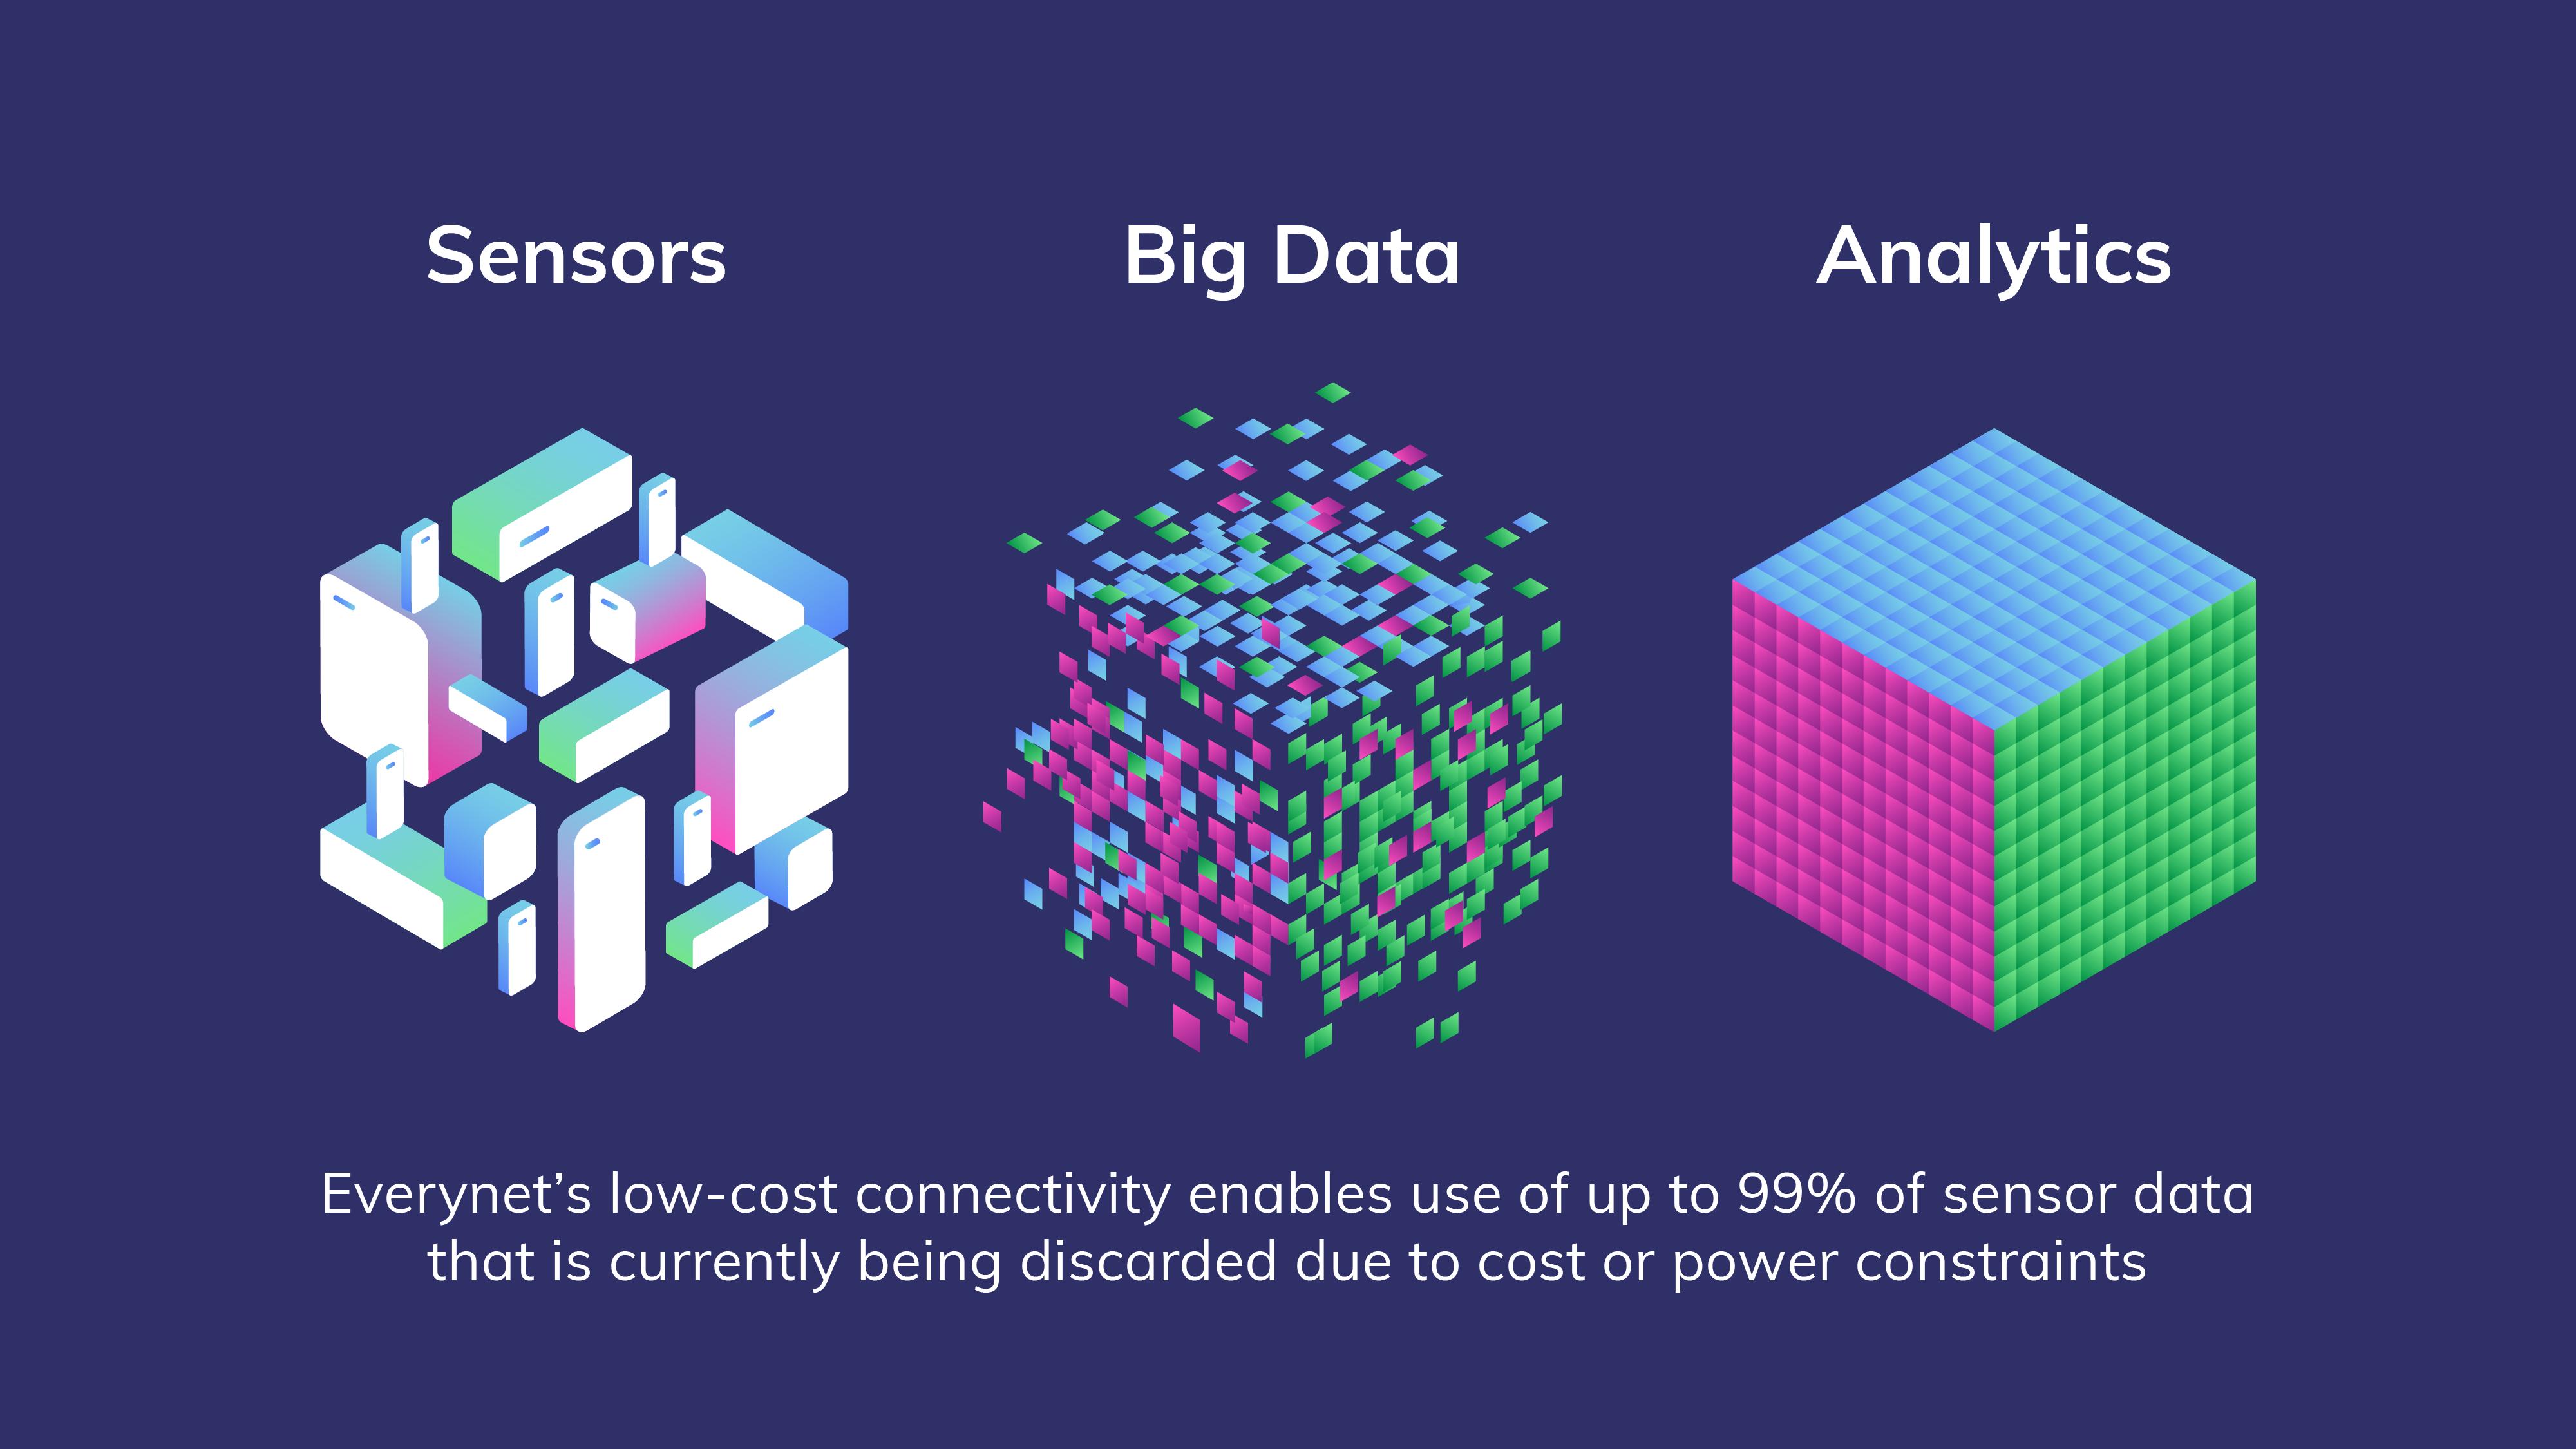 Everynet Big Data